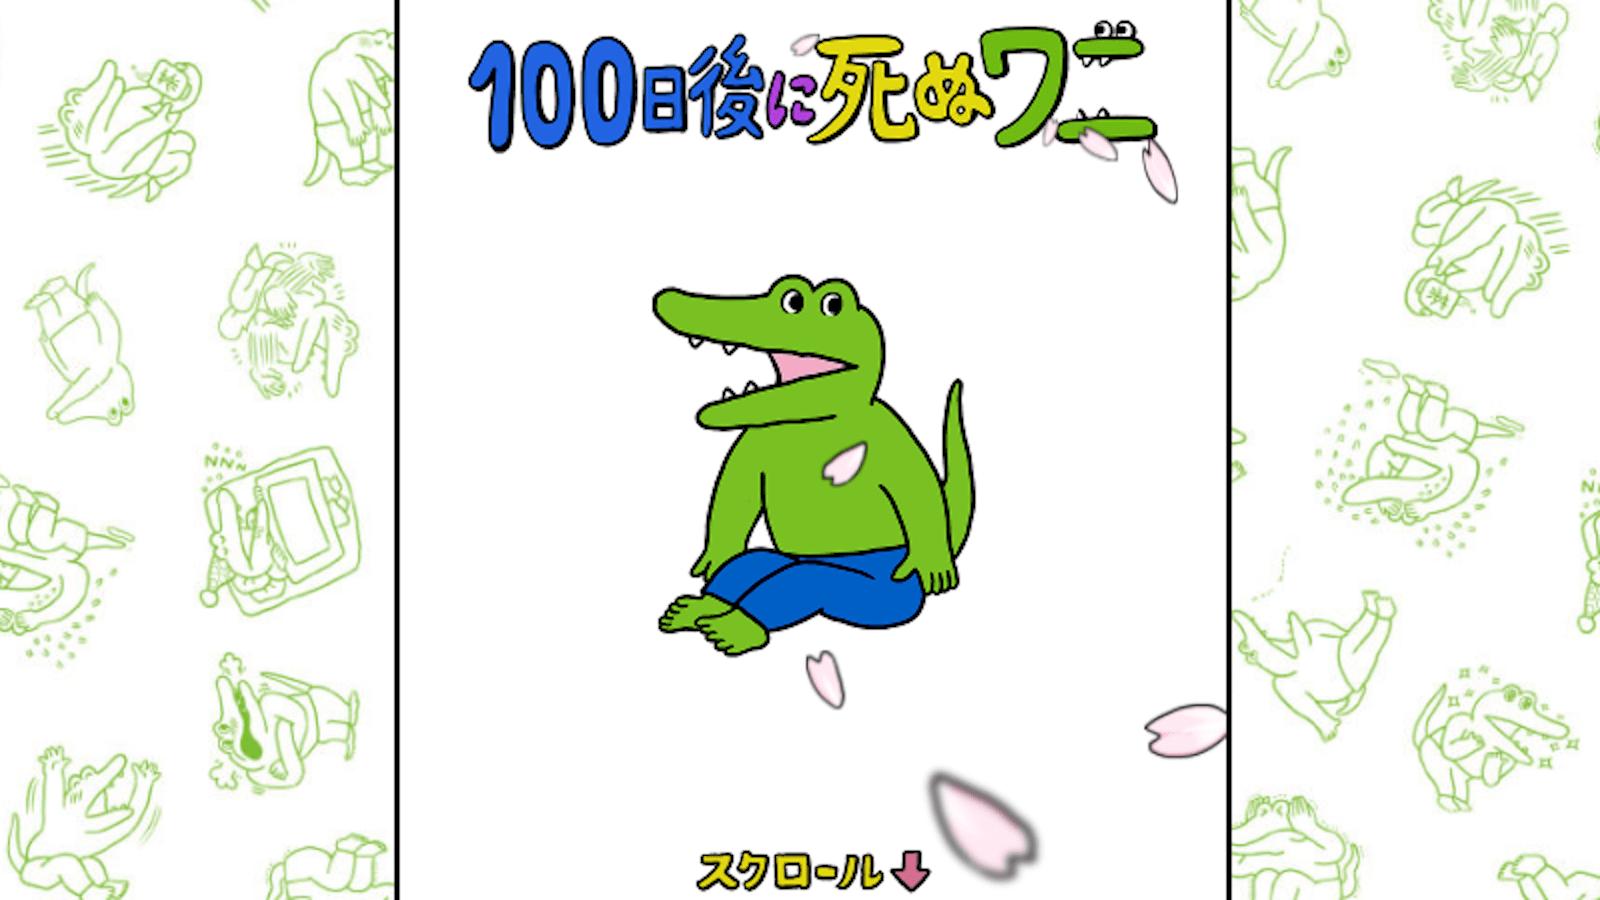 twitter 動画 ランキング 100